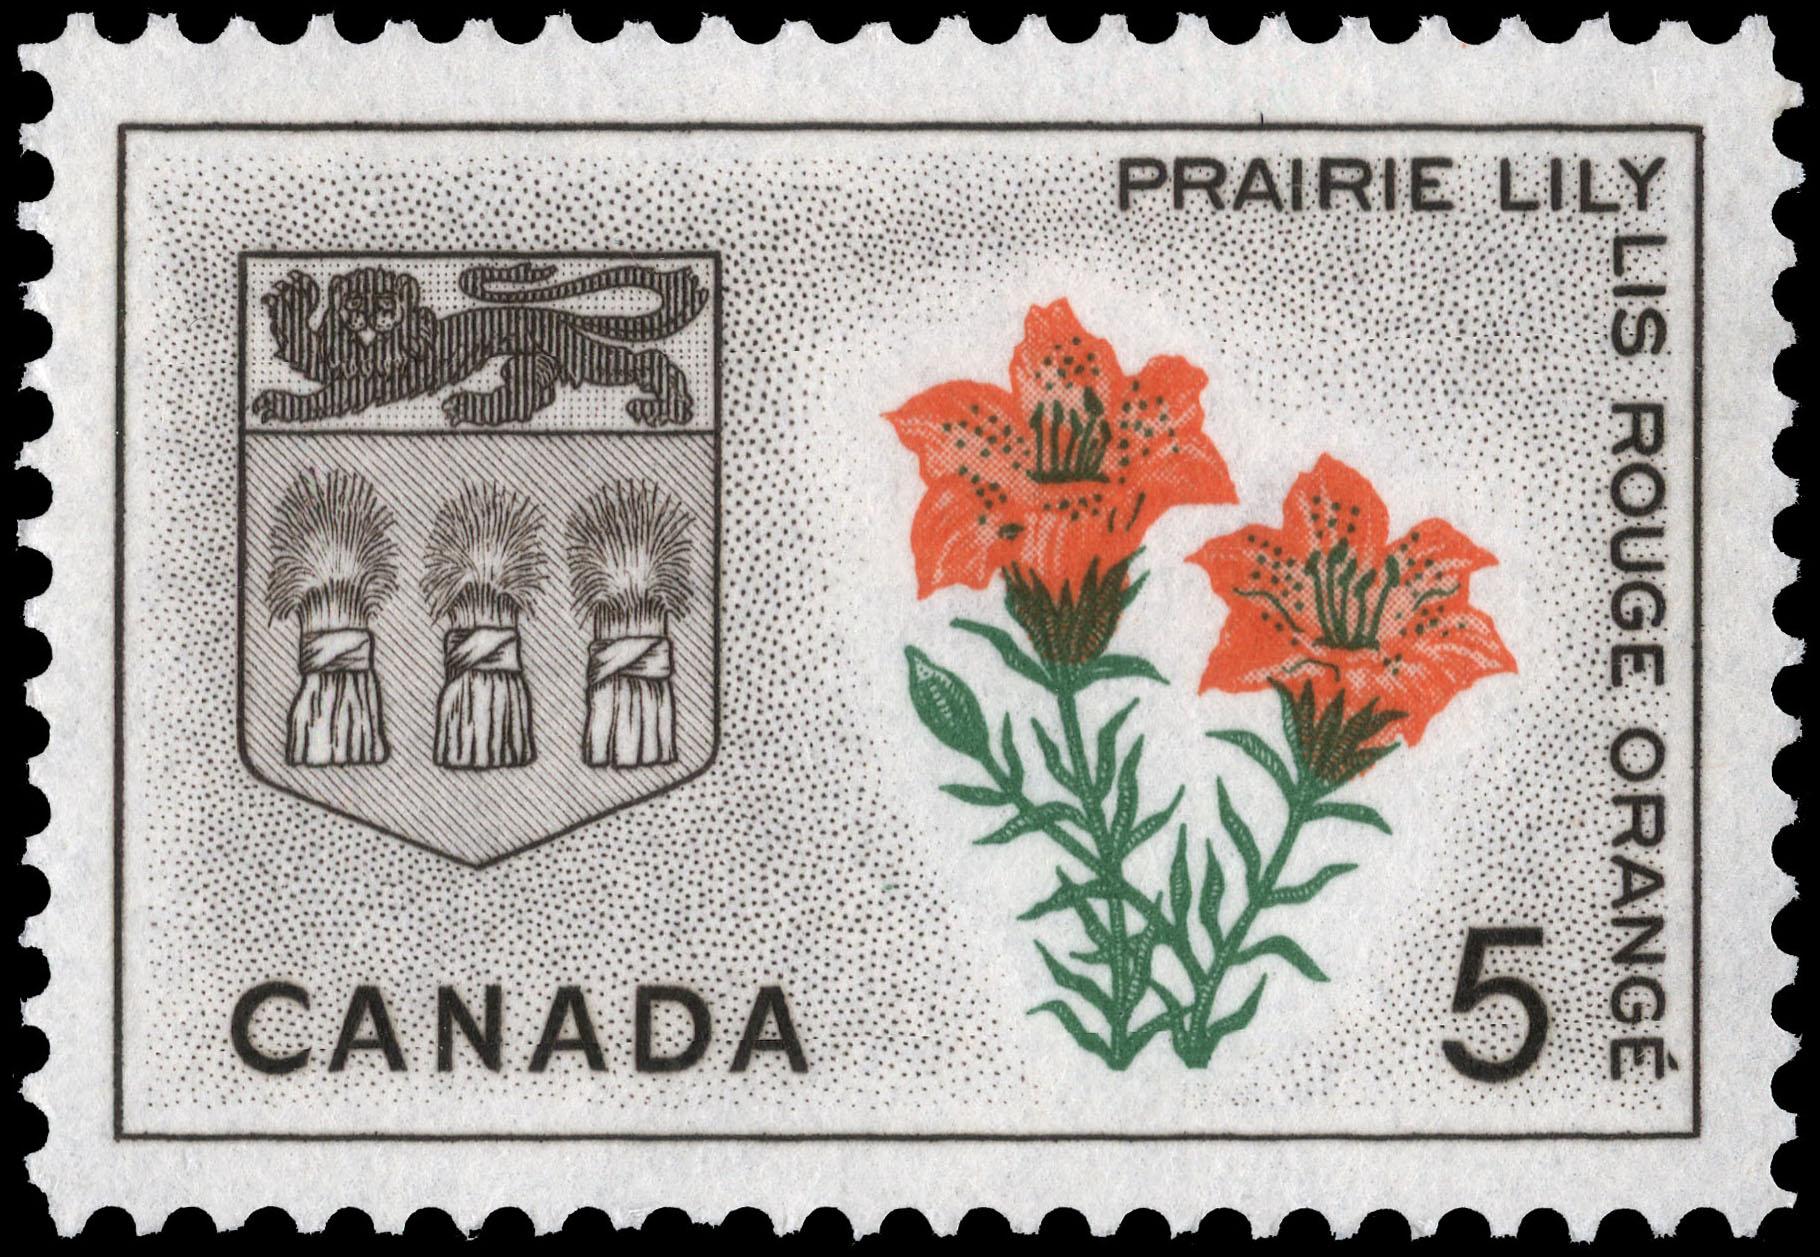 Prairie Lily, Saskatchewan Canada Postage Stamp